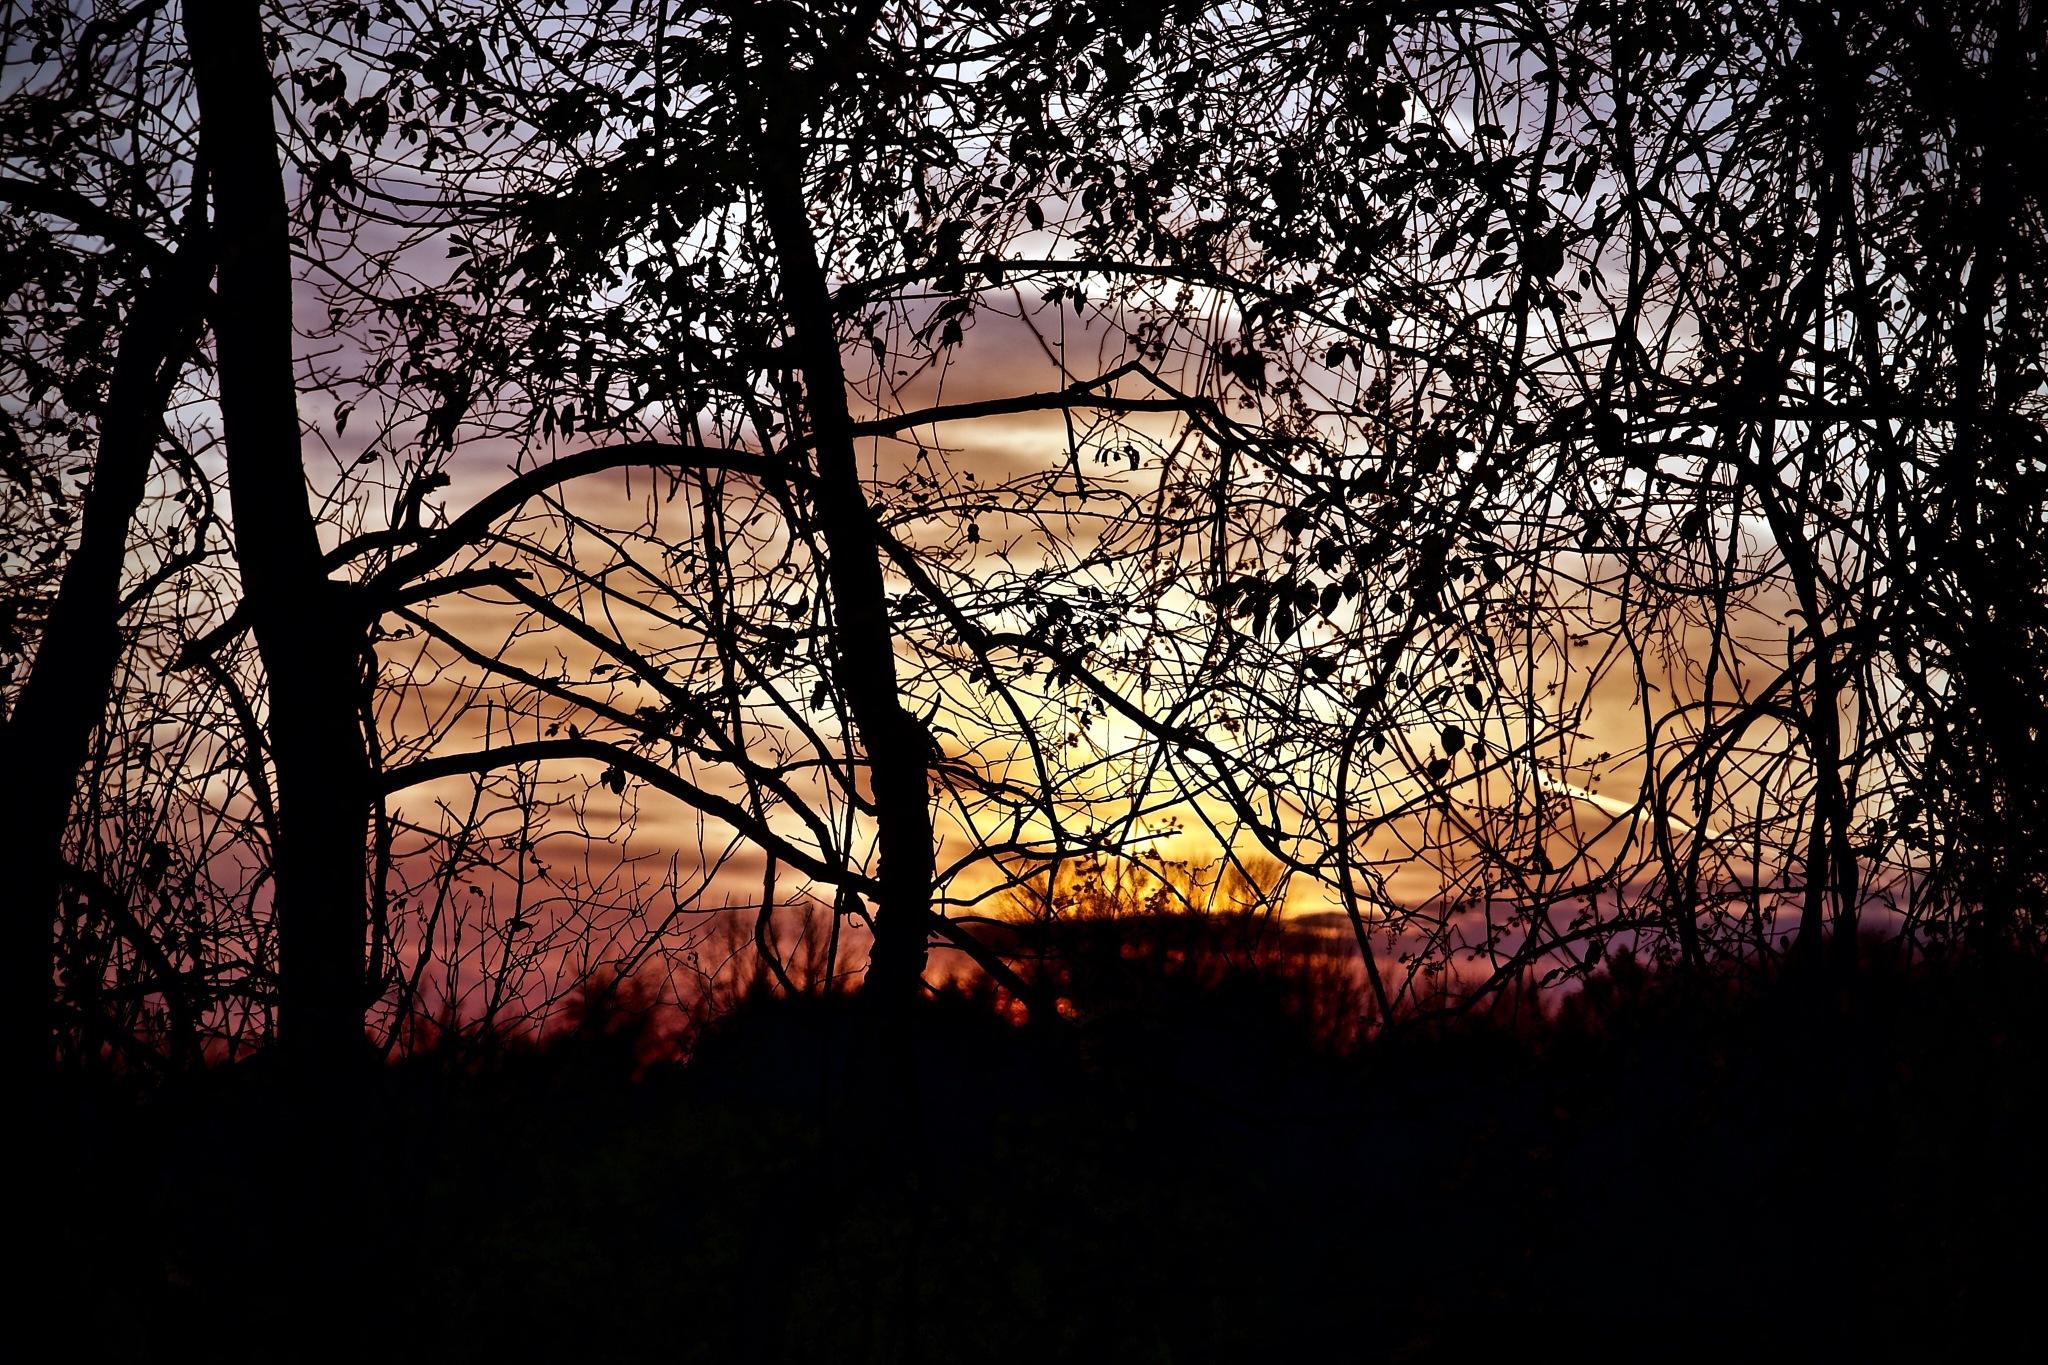 Sunset  by Drnoma